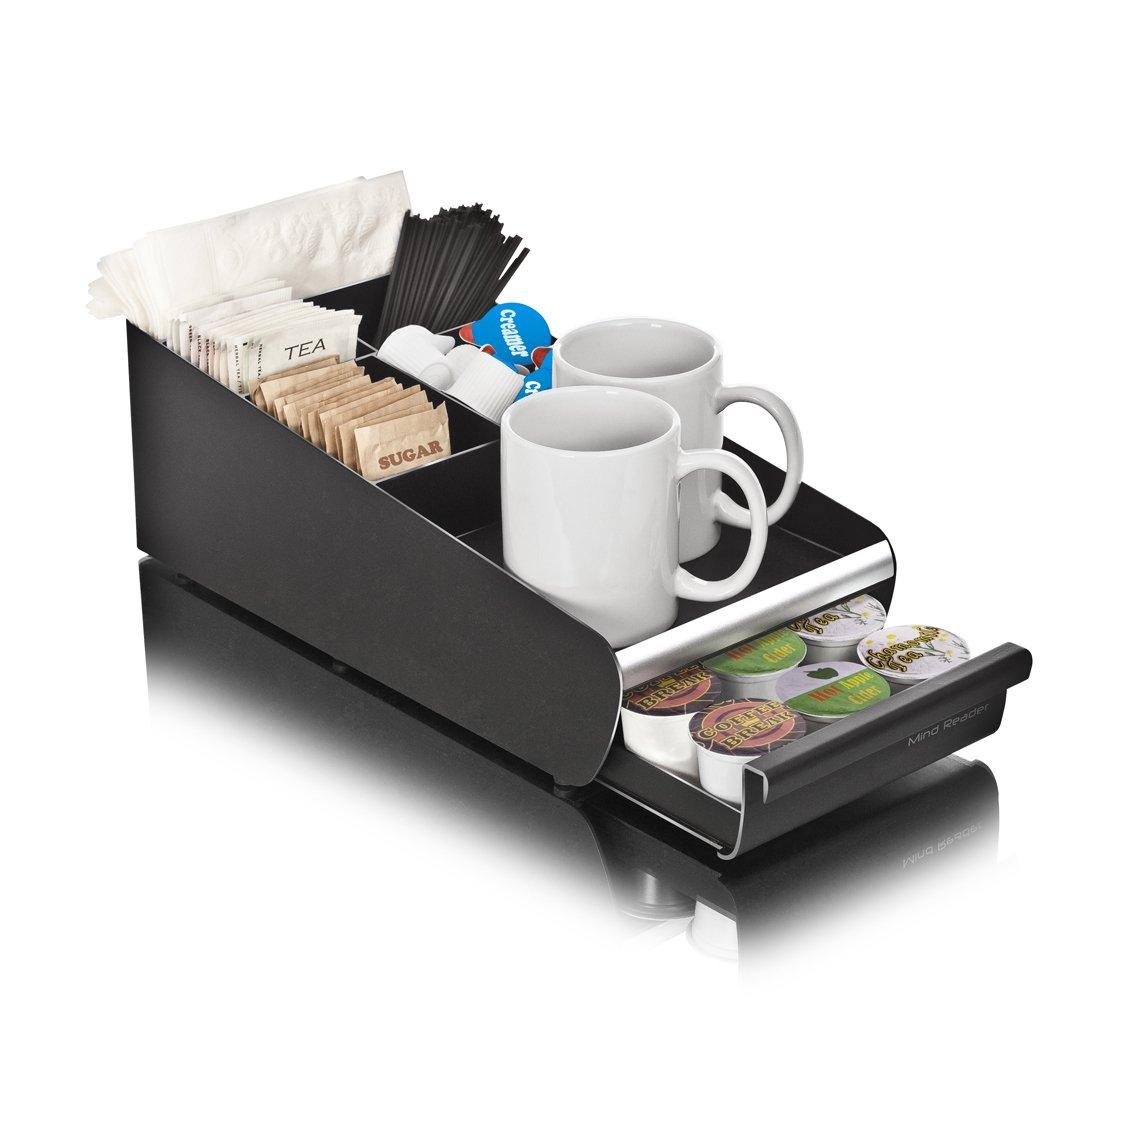 Mind Reader Coffee Condiment Storage Organizer with K-Cup Single Serve Coffee Pod Drawer, Black